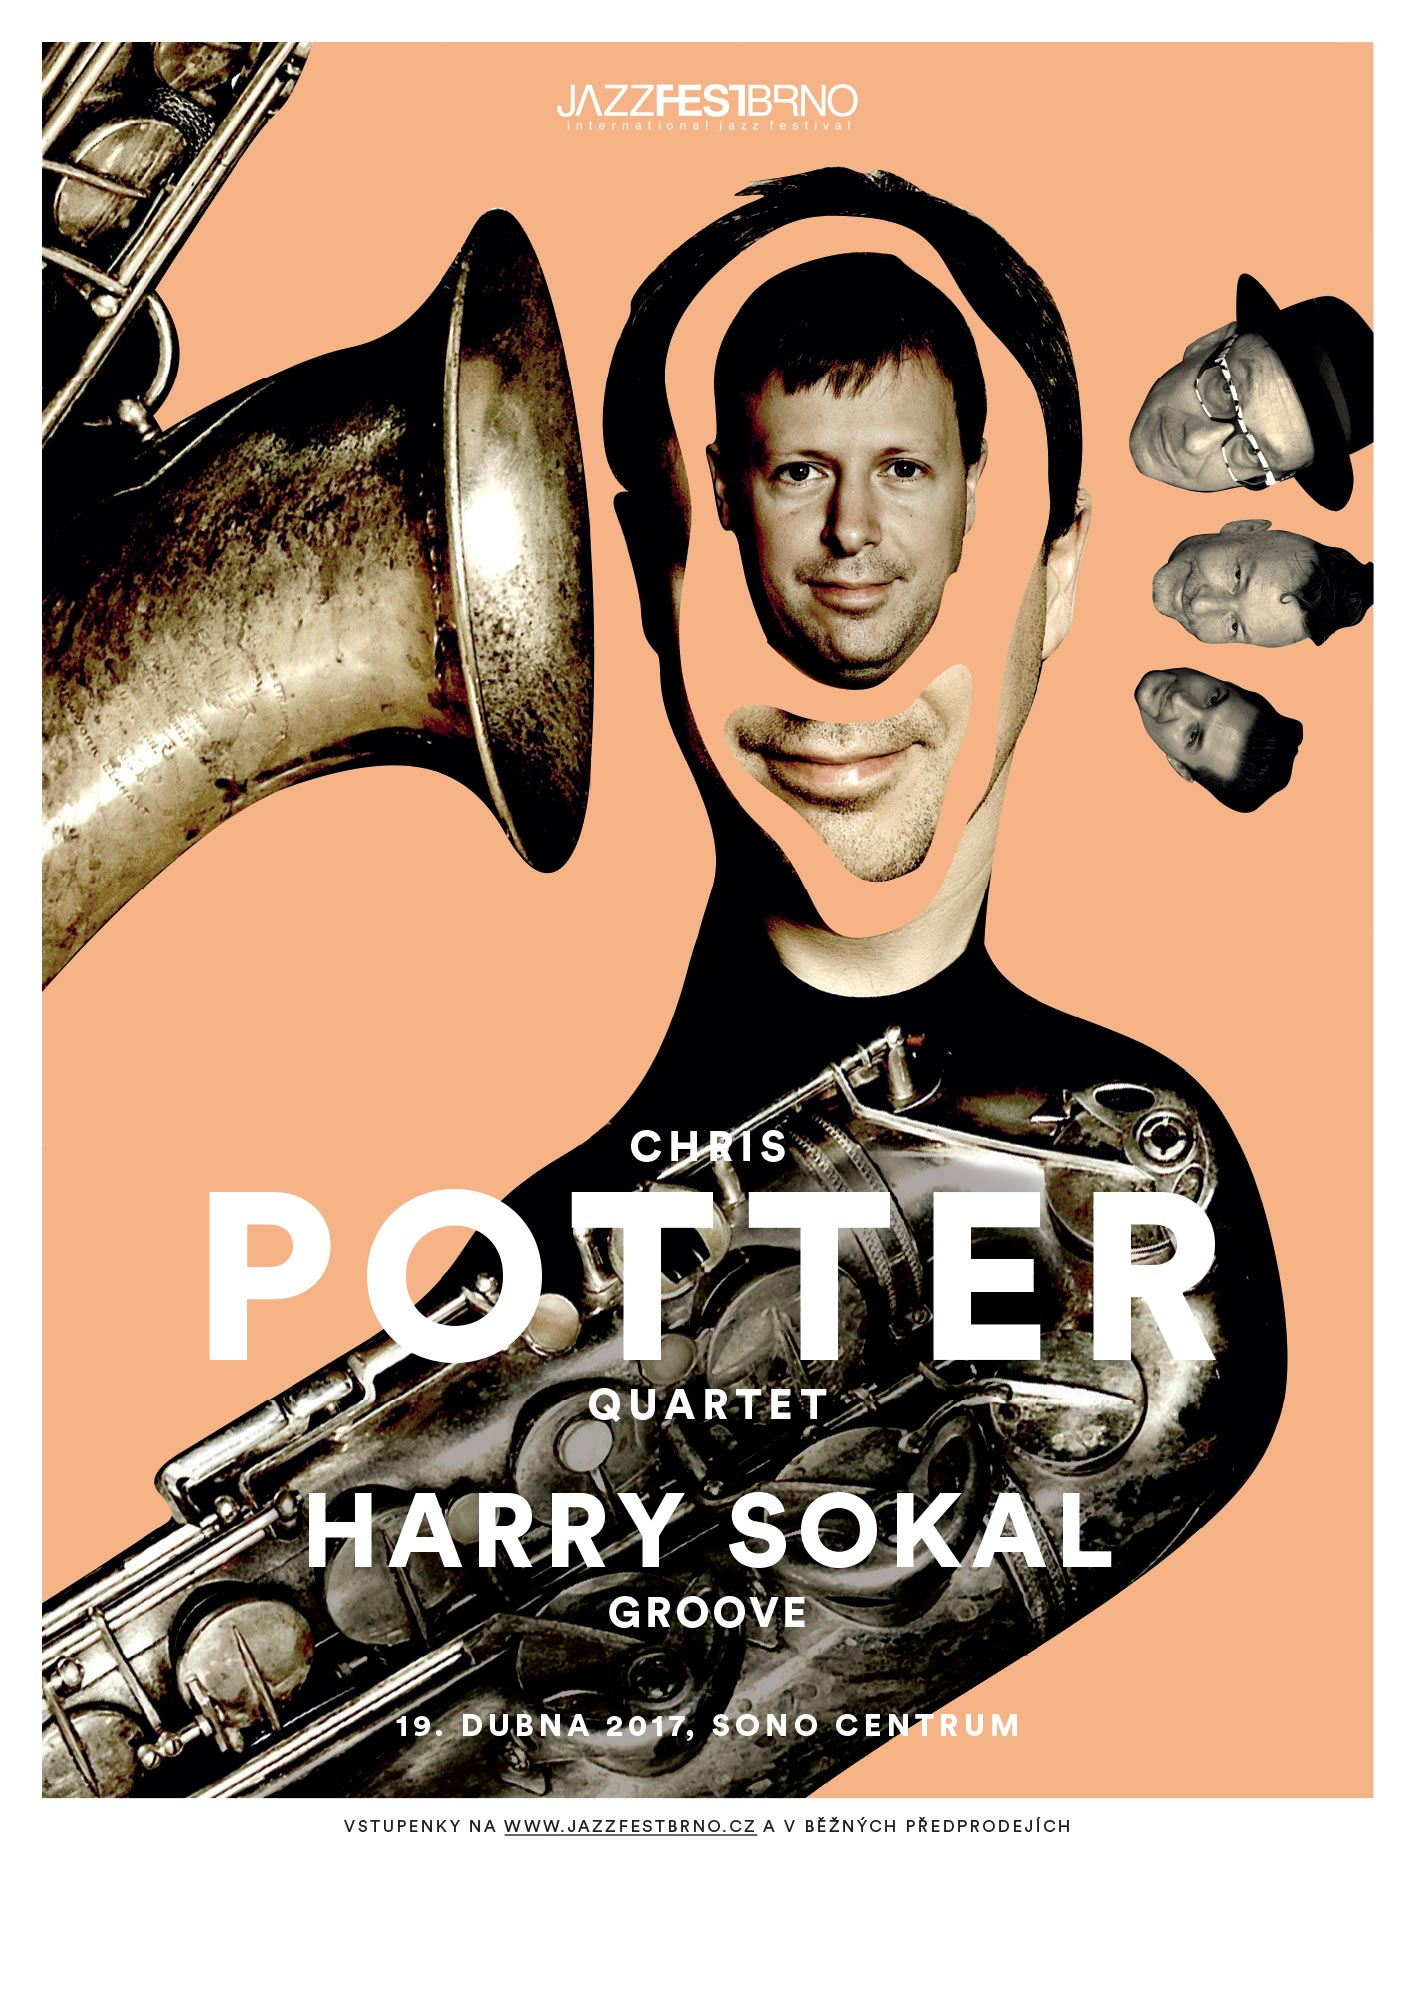 Jazzfestbrno 2017 - Chris Potter a Harry Sokal Groove